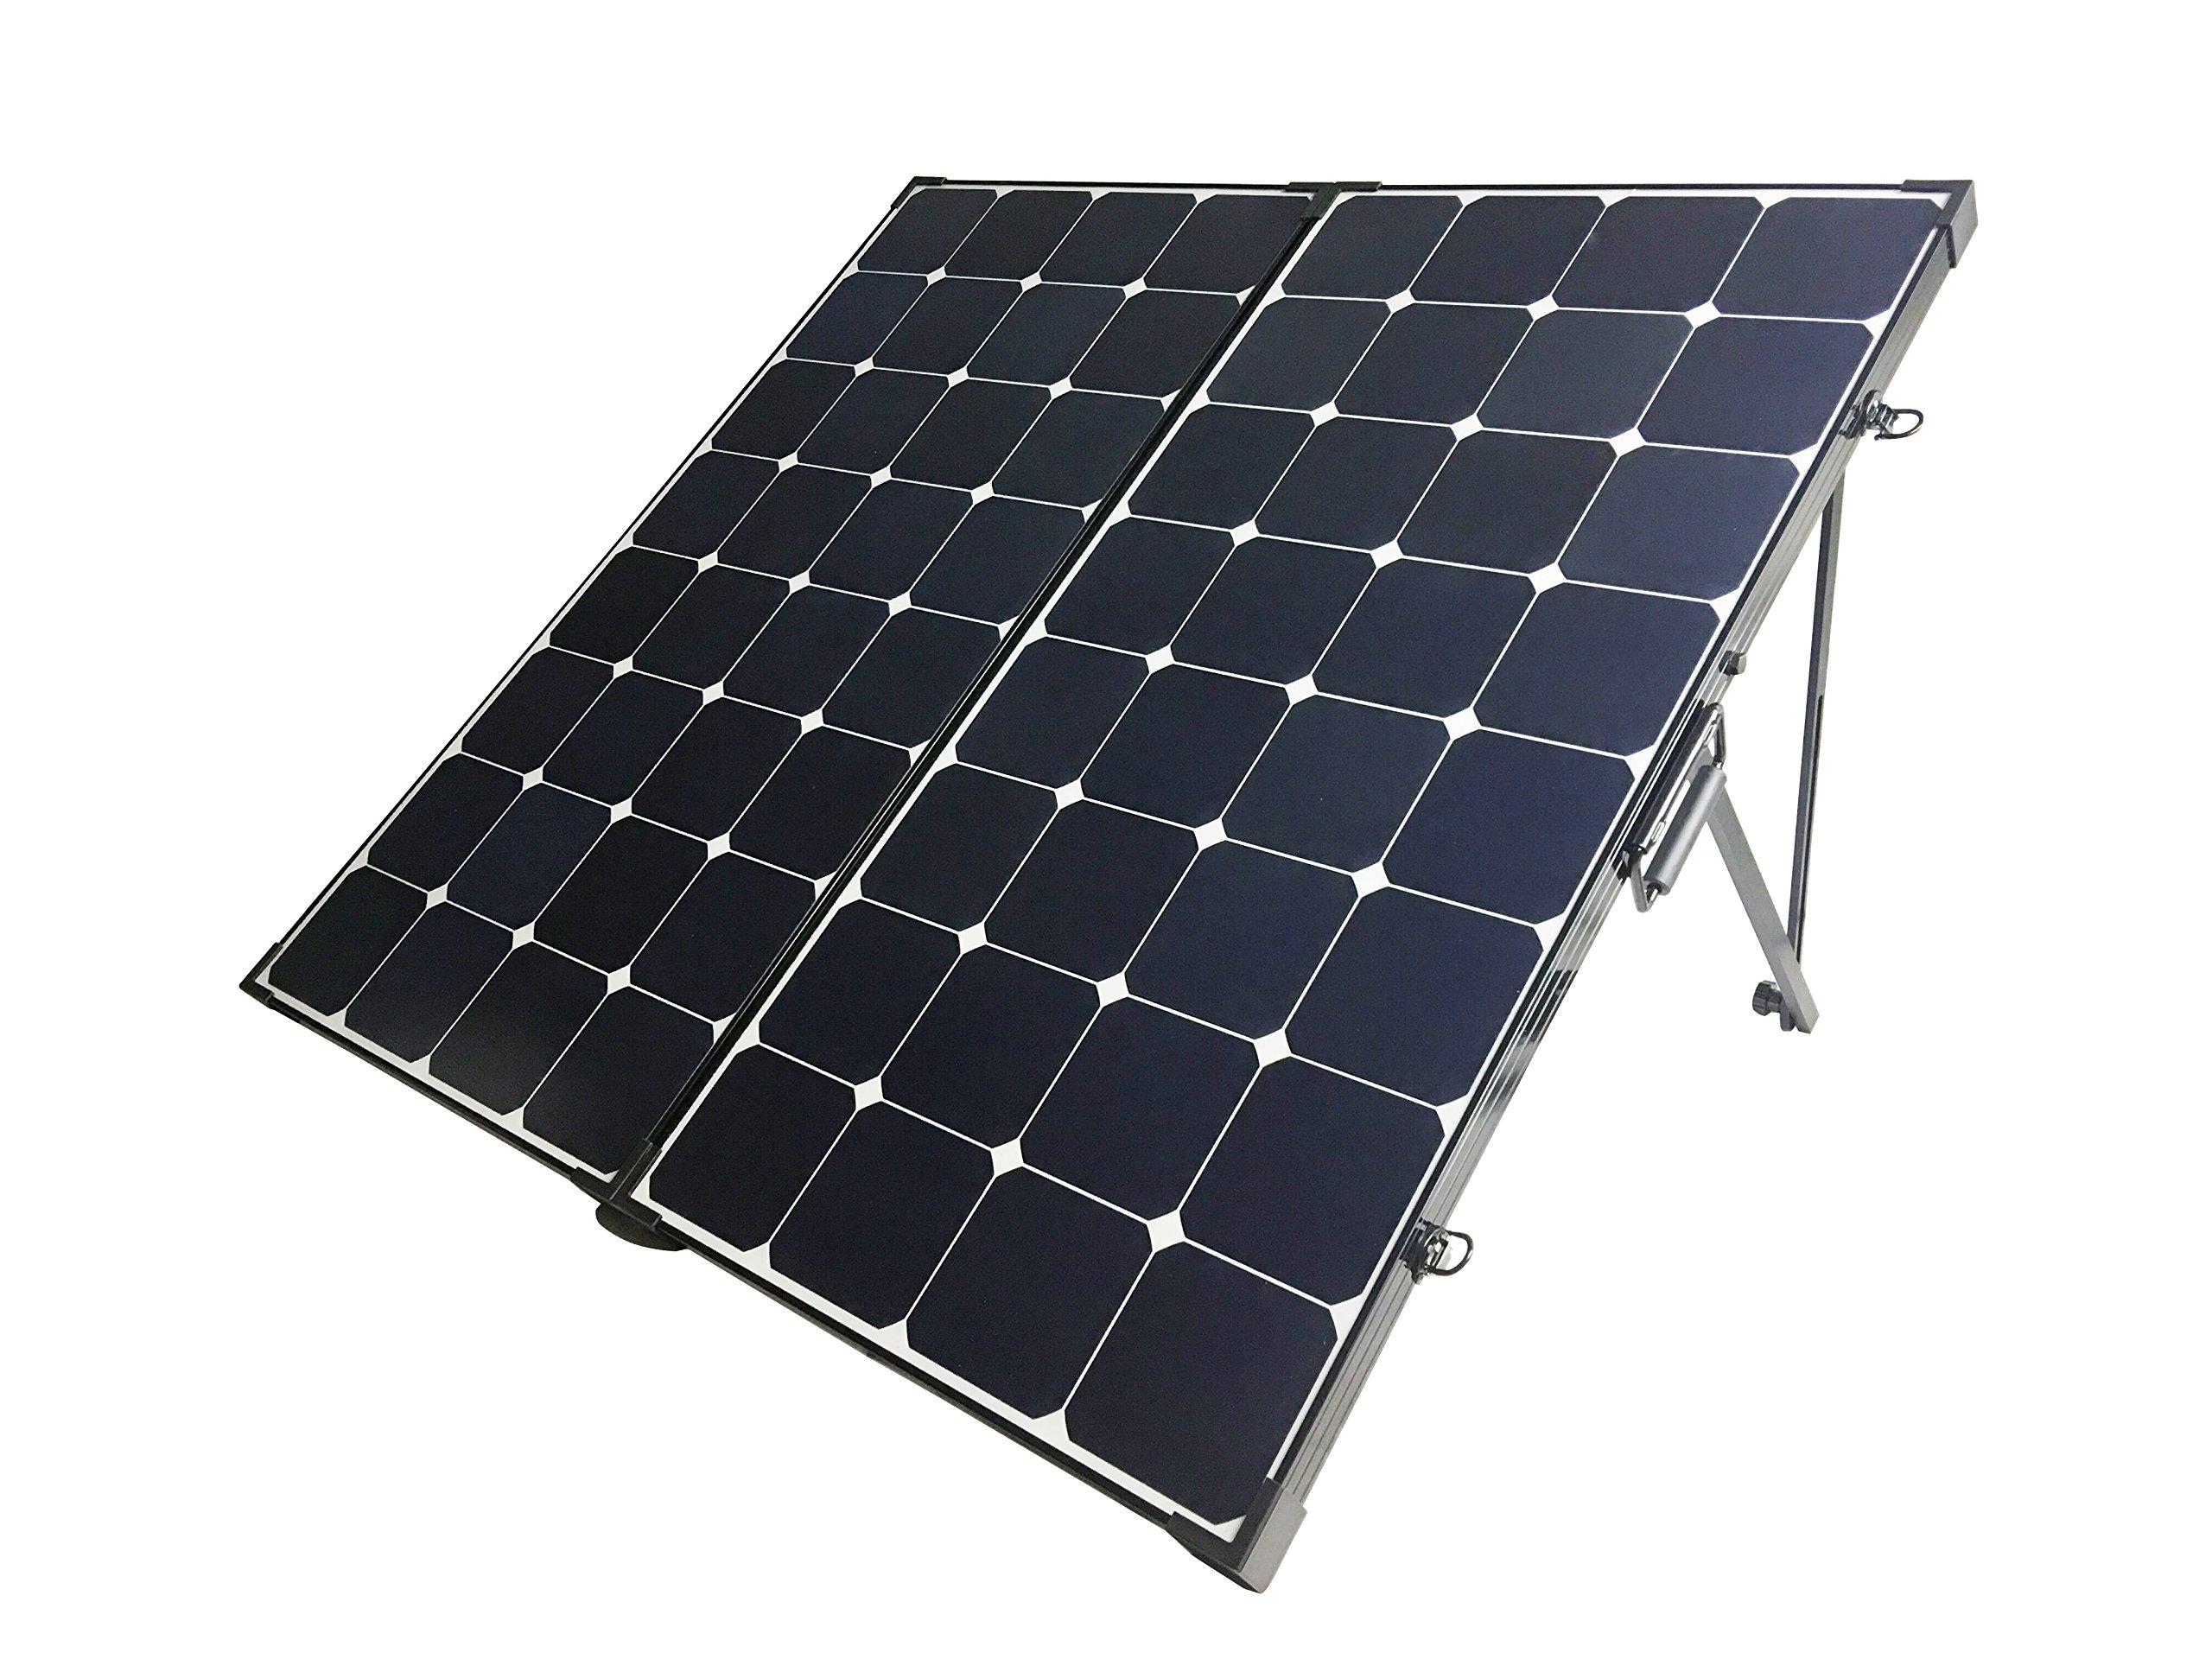 Renogy 200 Watt Eclipse Monocrystalline Solar Suitcase with Charge Controller